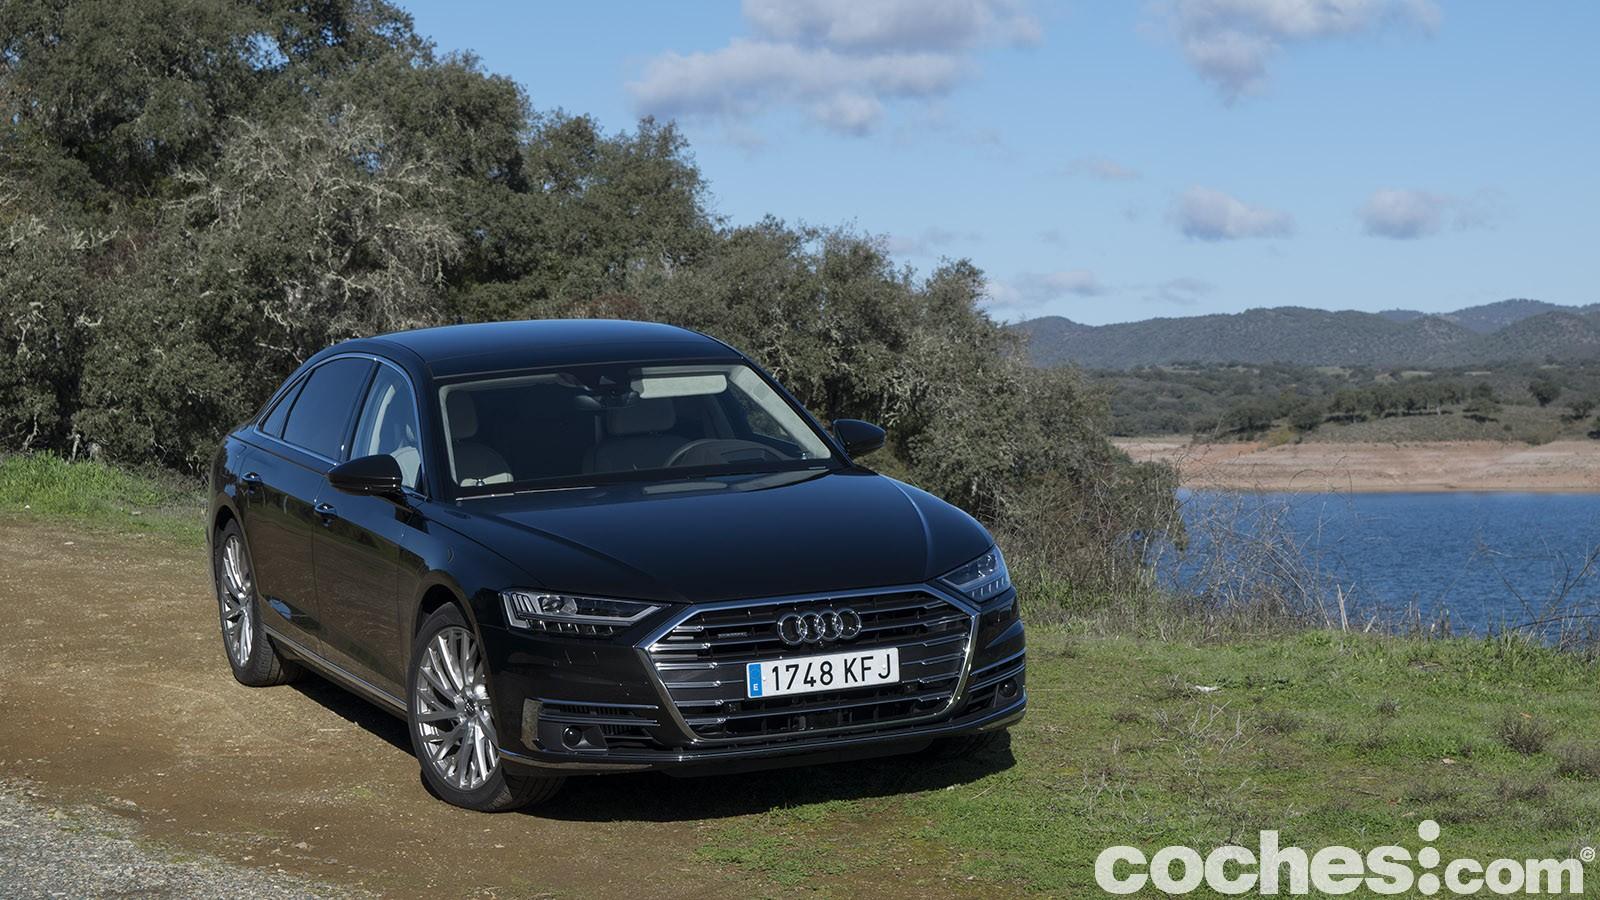 Prueba contacto Audi A8 L 50 TDI, ¿conducir o ir atrás?